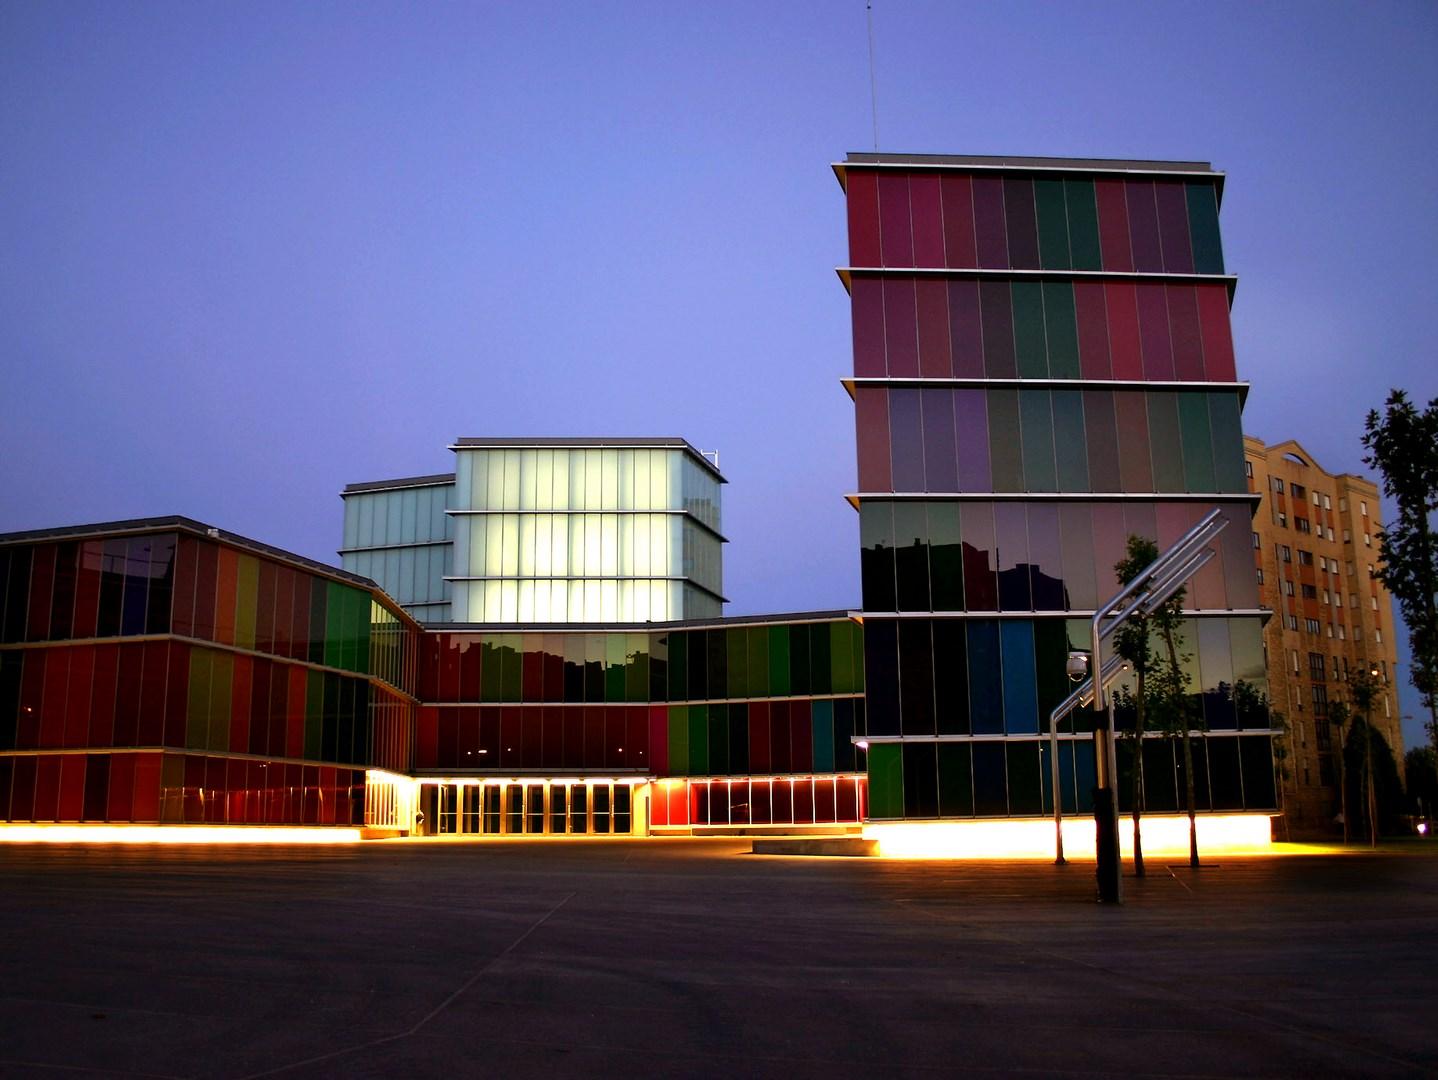 Illuminated façade